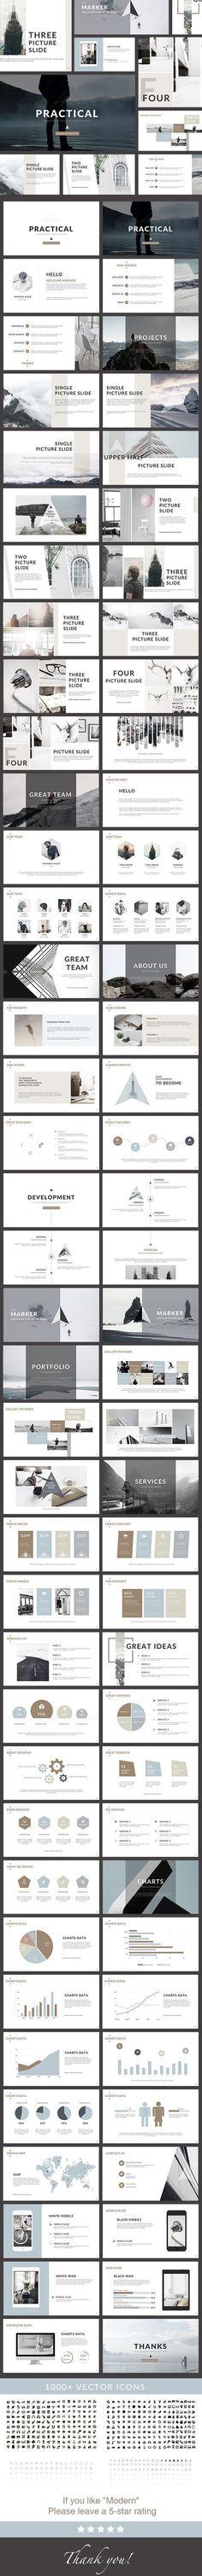 42 best best powerpoint templates images on pinterest keynote practical clean powerpoint presentation creative powerpoint templates toneelgroepblik Choice Image